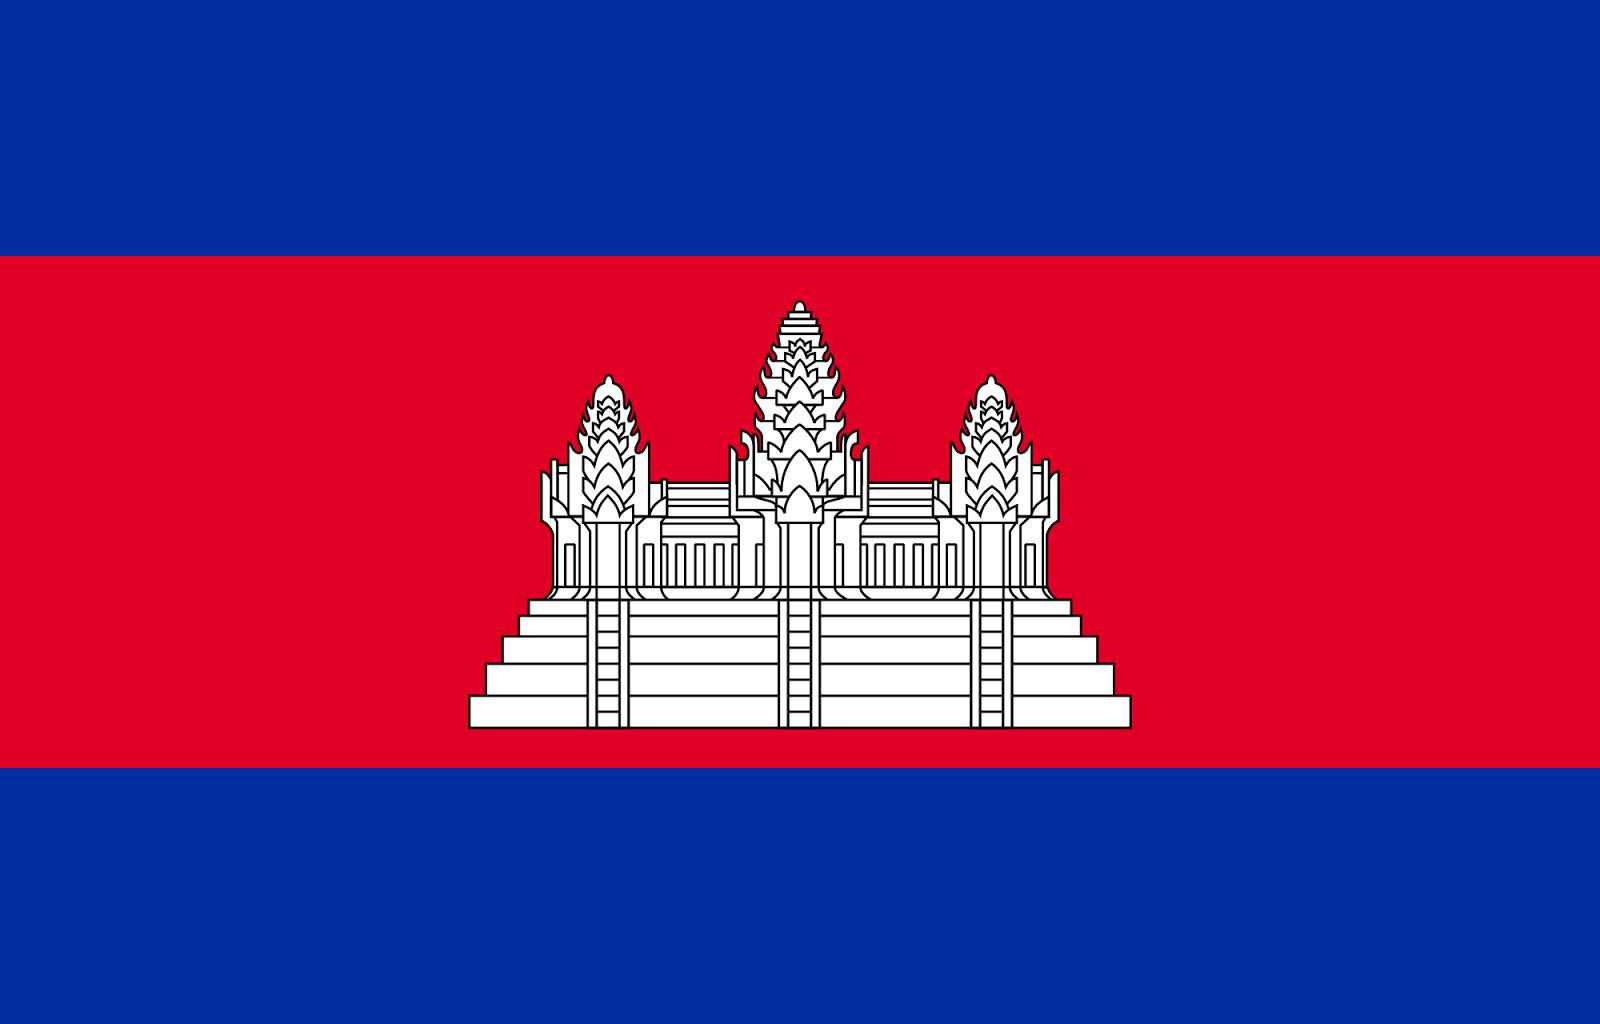 http://carbrandsincurrentproduction.blogspot.com.es/search/label/Cambodia